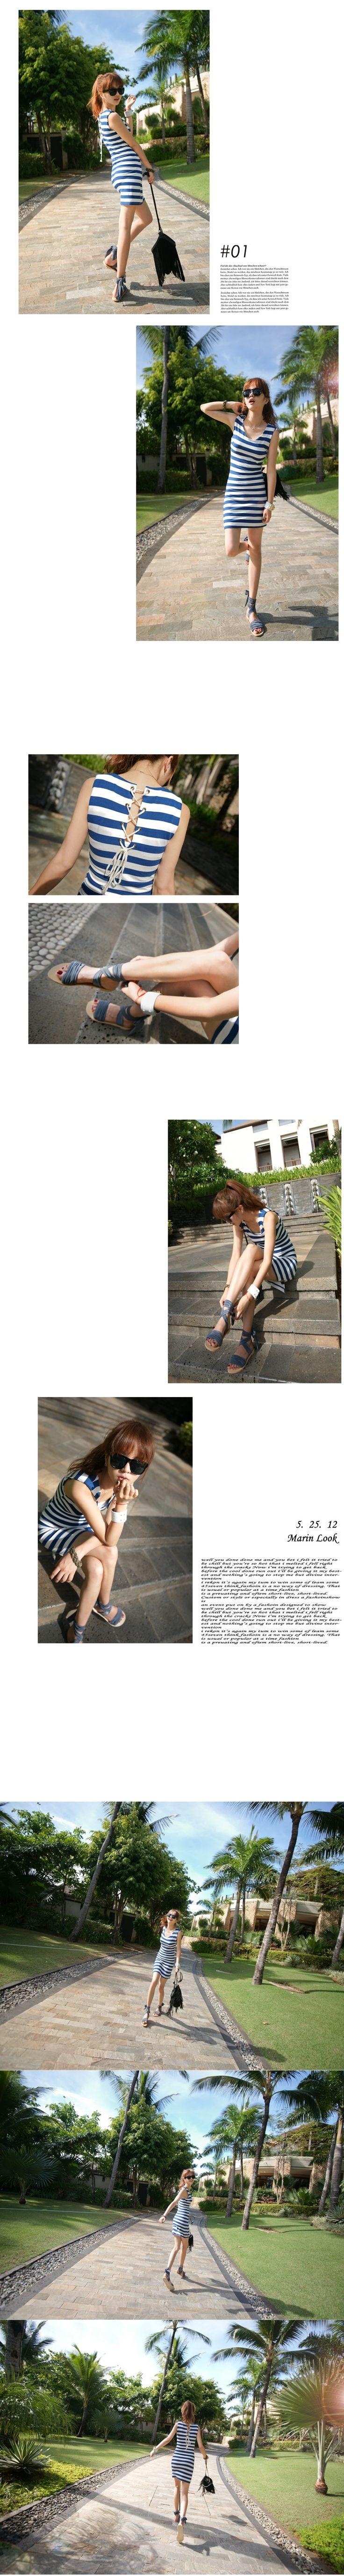 korean fashion girl-Corset striped dress (2colors) $39 on kstargoods.com (The best kpop shop)